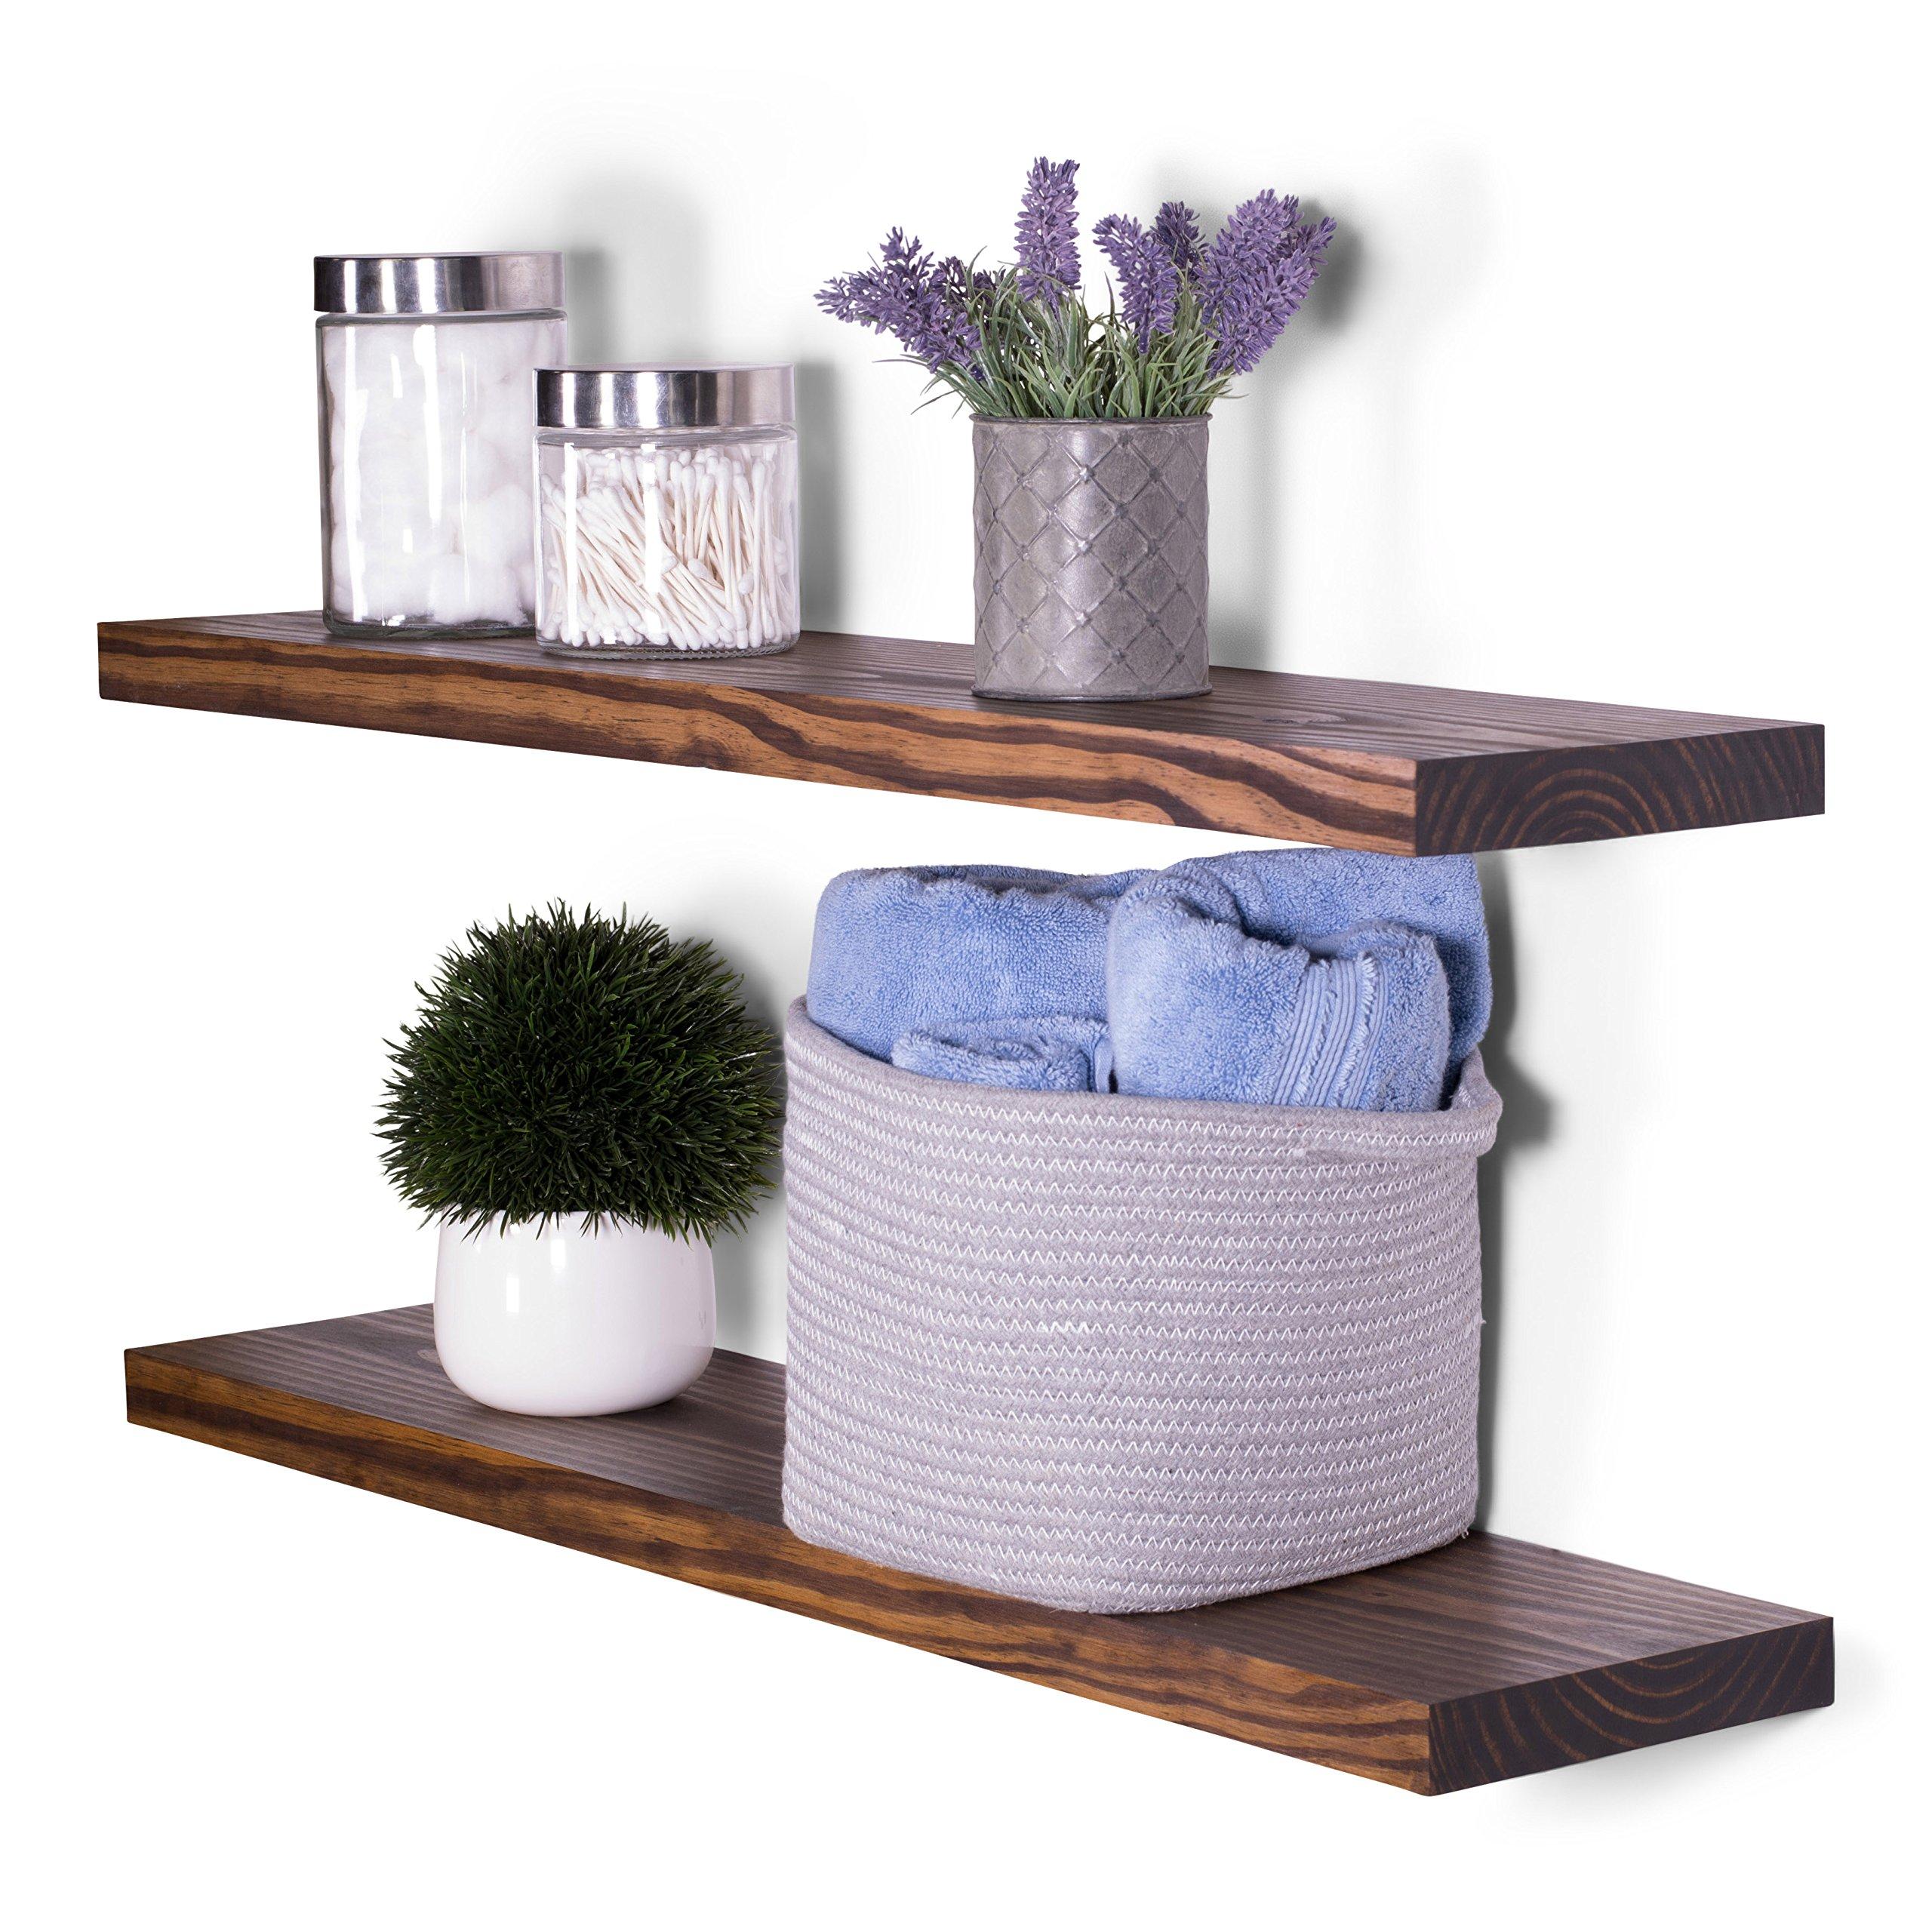 DAKODA LOVE 8'' Deep Clean Edge Floating Shelves, USA Handmade, Clear Coat Finish, 100% Countersunk Hidden Floating Shelf Brackets, Beautiful Grain Pine Wood Wall Decor (Set of 2) (36'', Espresso)